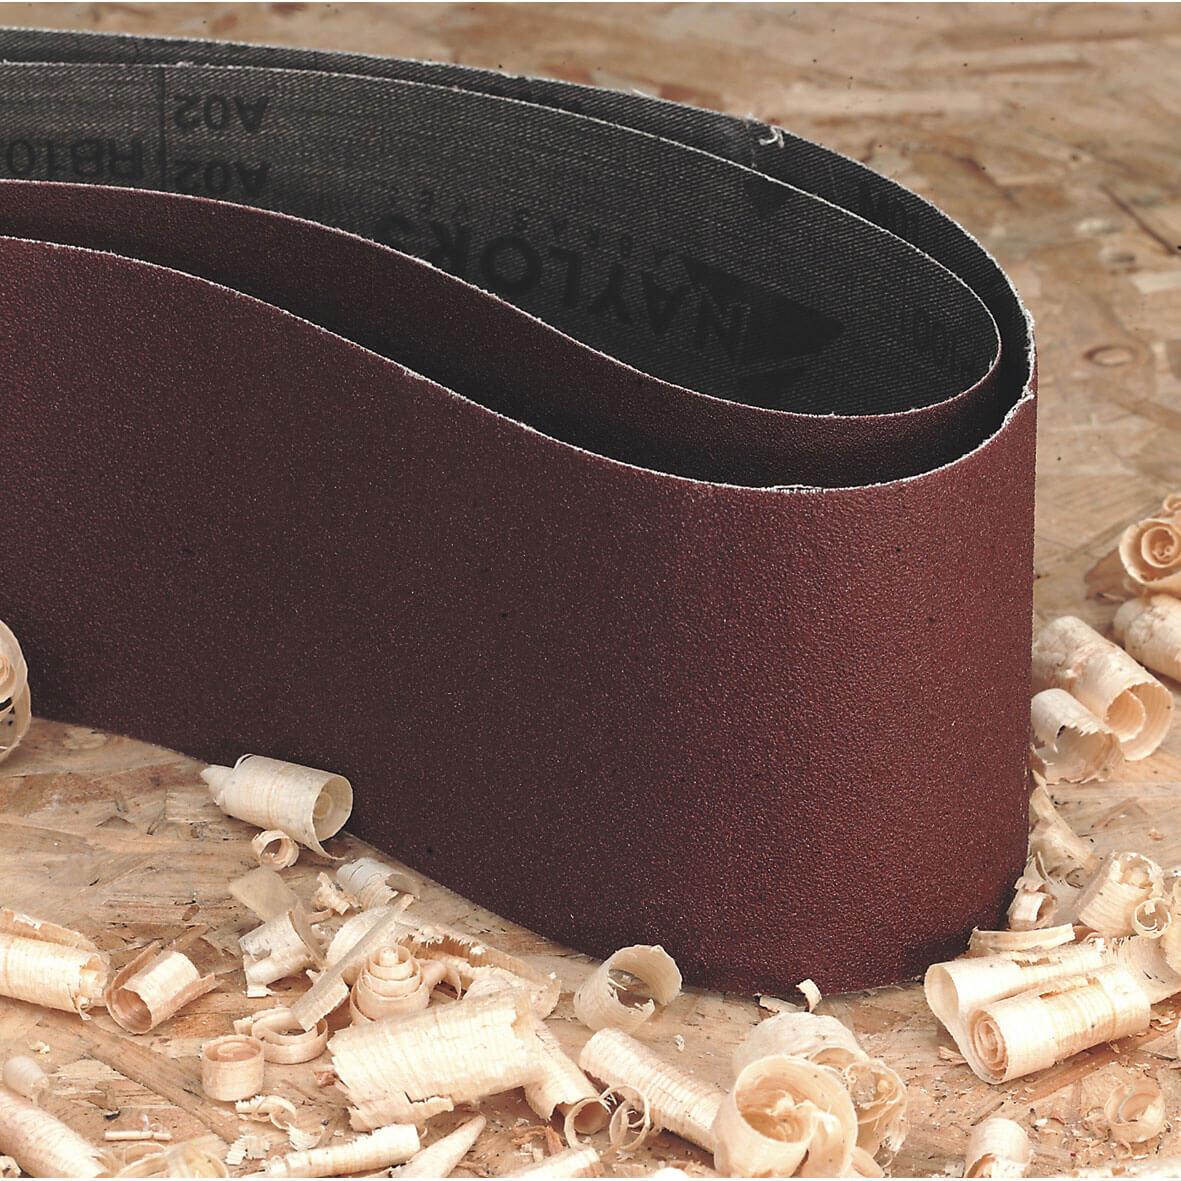 Image of Sealey 100mm x 915mm Sanding Belt 100mm x 915mm 60g Pack of 1